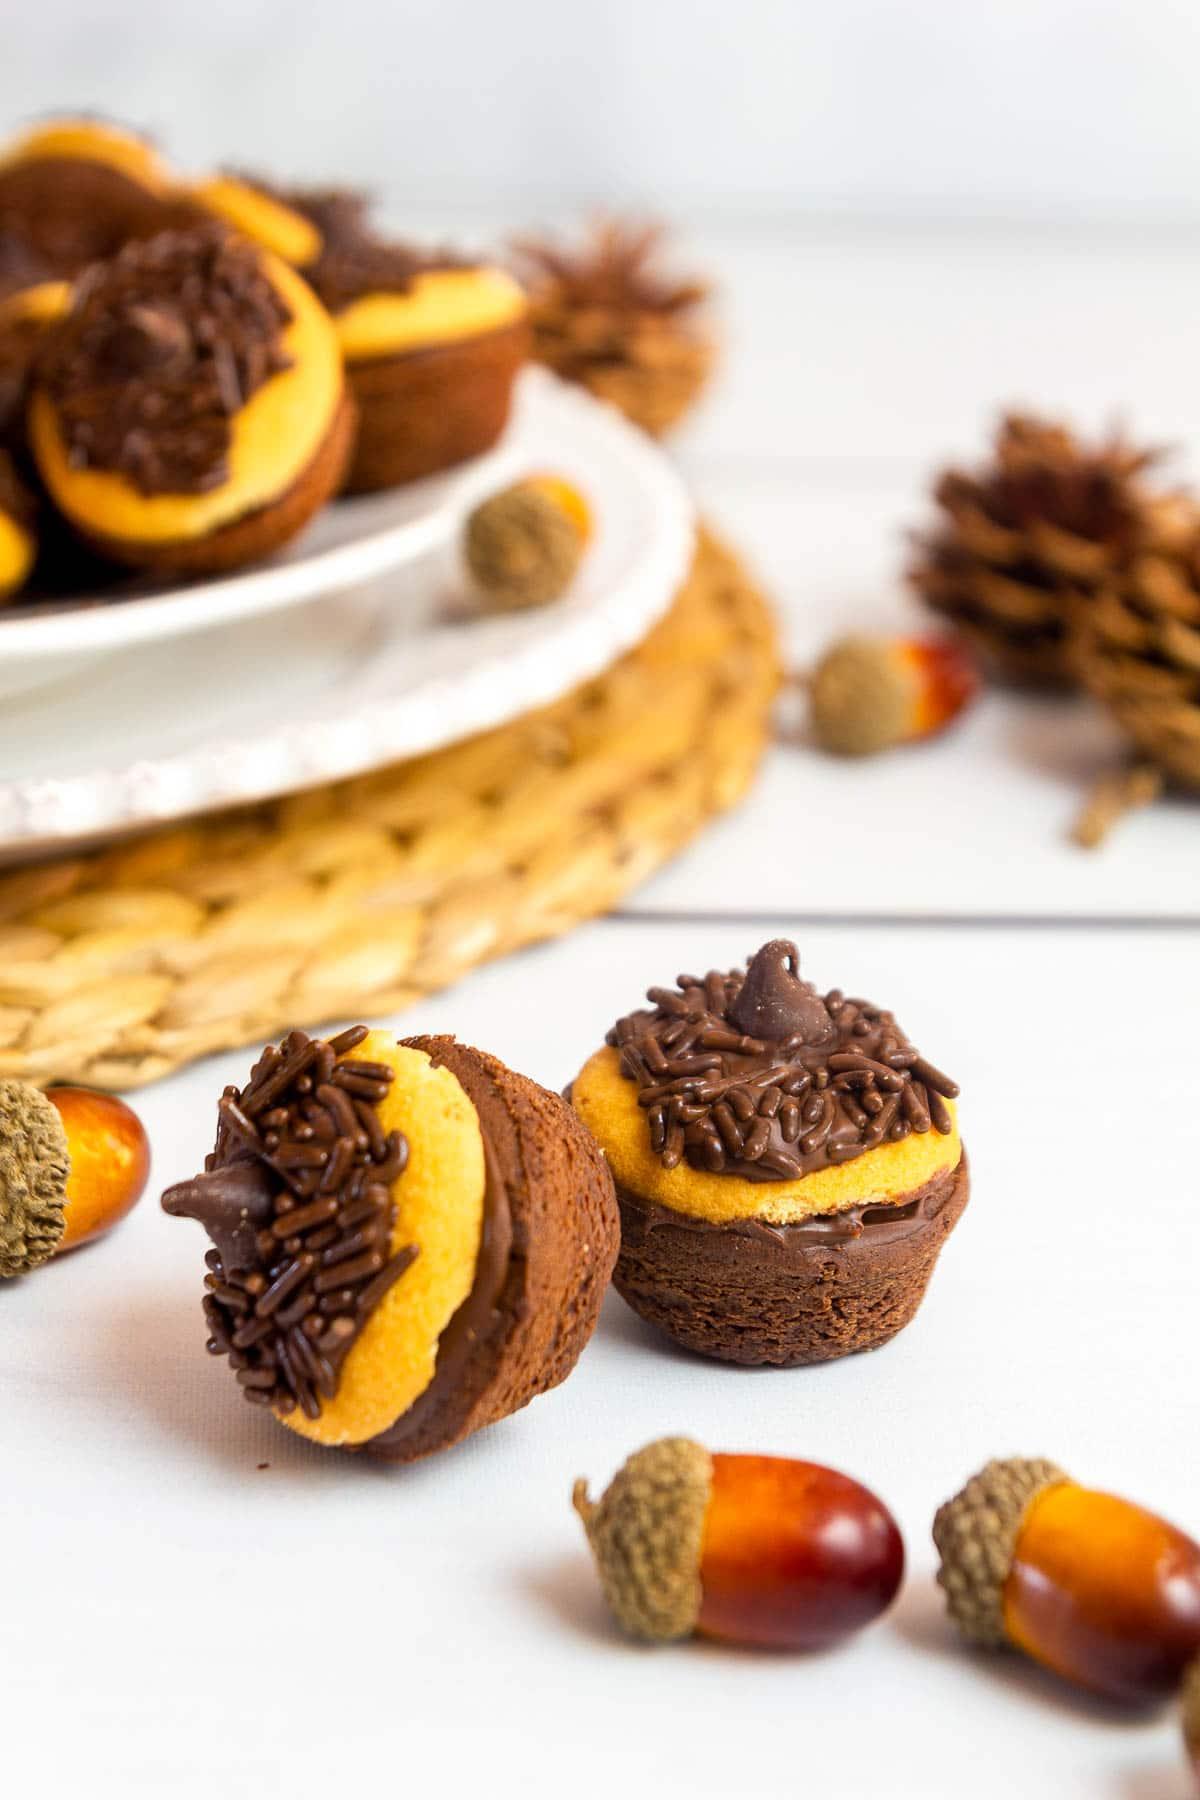 acorn brownie bites close on table